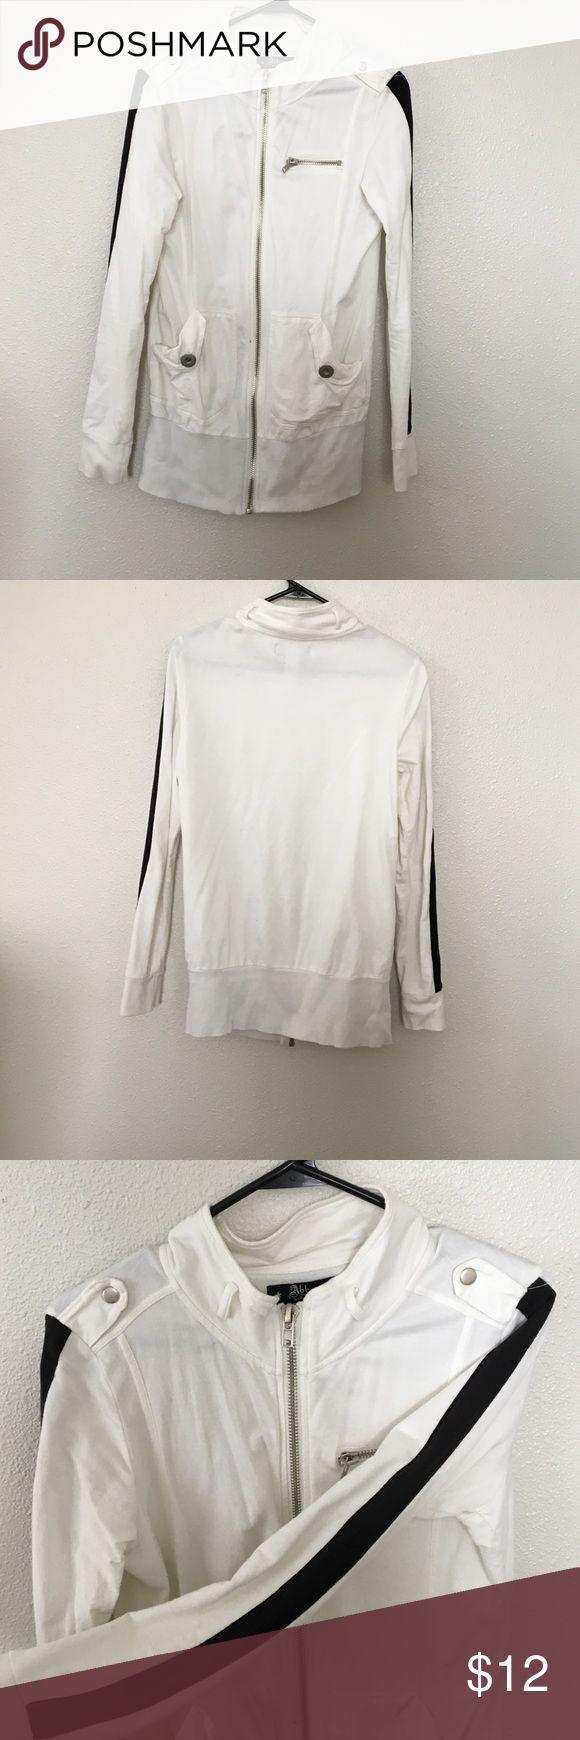 Women's zip up black & white sweatshirt Zip up sweatshirt. Black stripes down sleeve. EUC Tops Sweatshirts & Hoodies